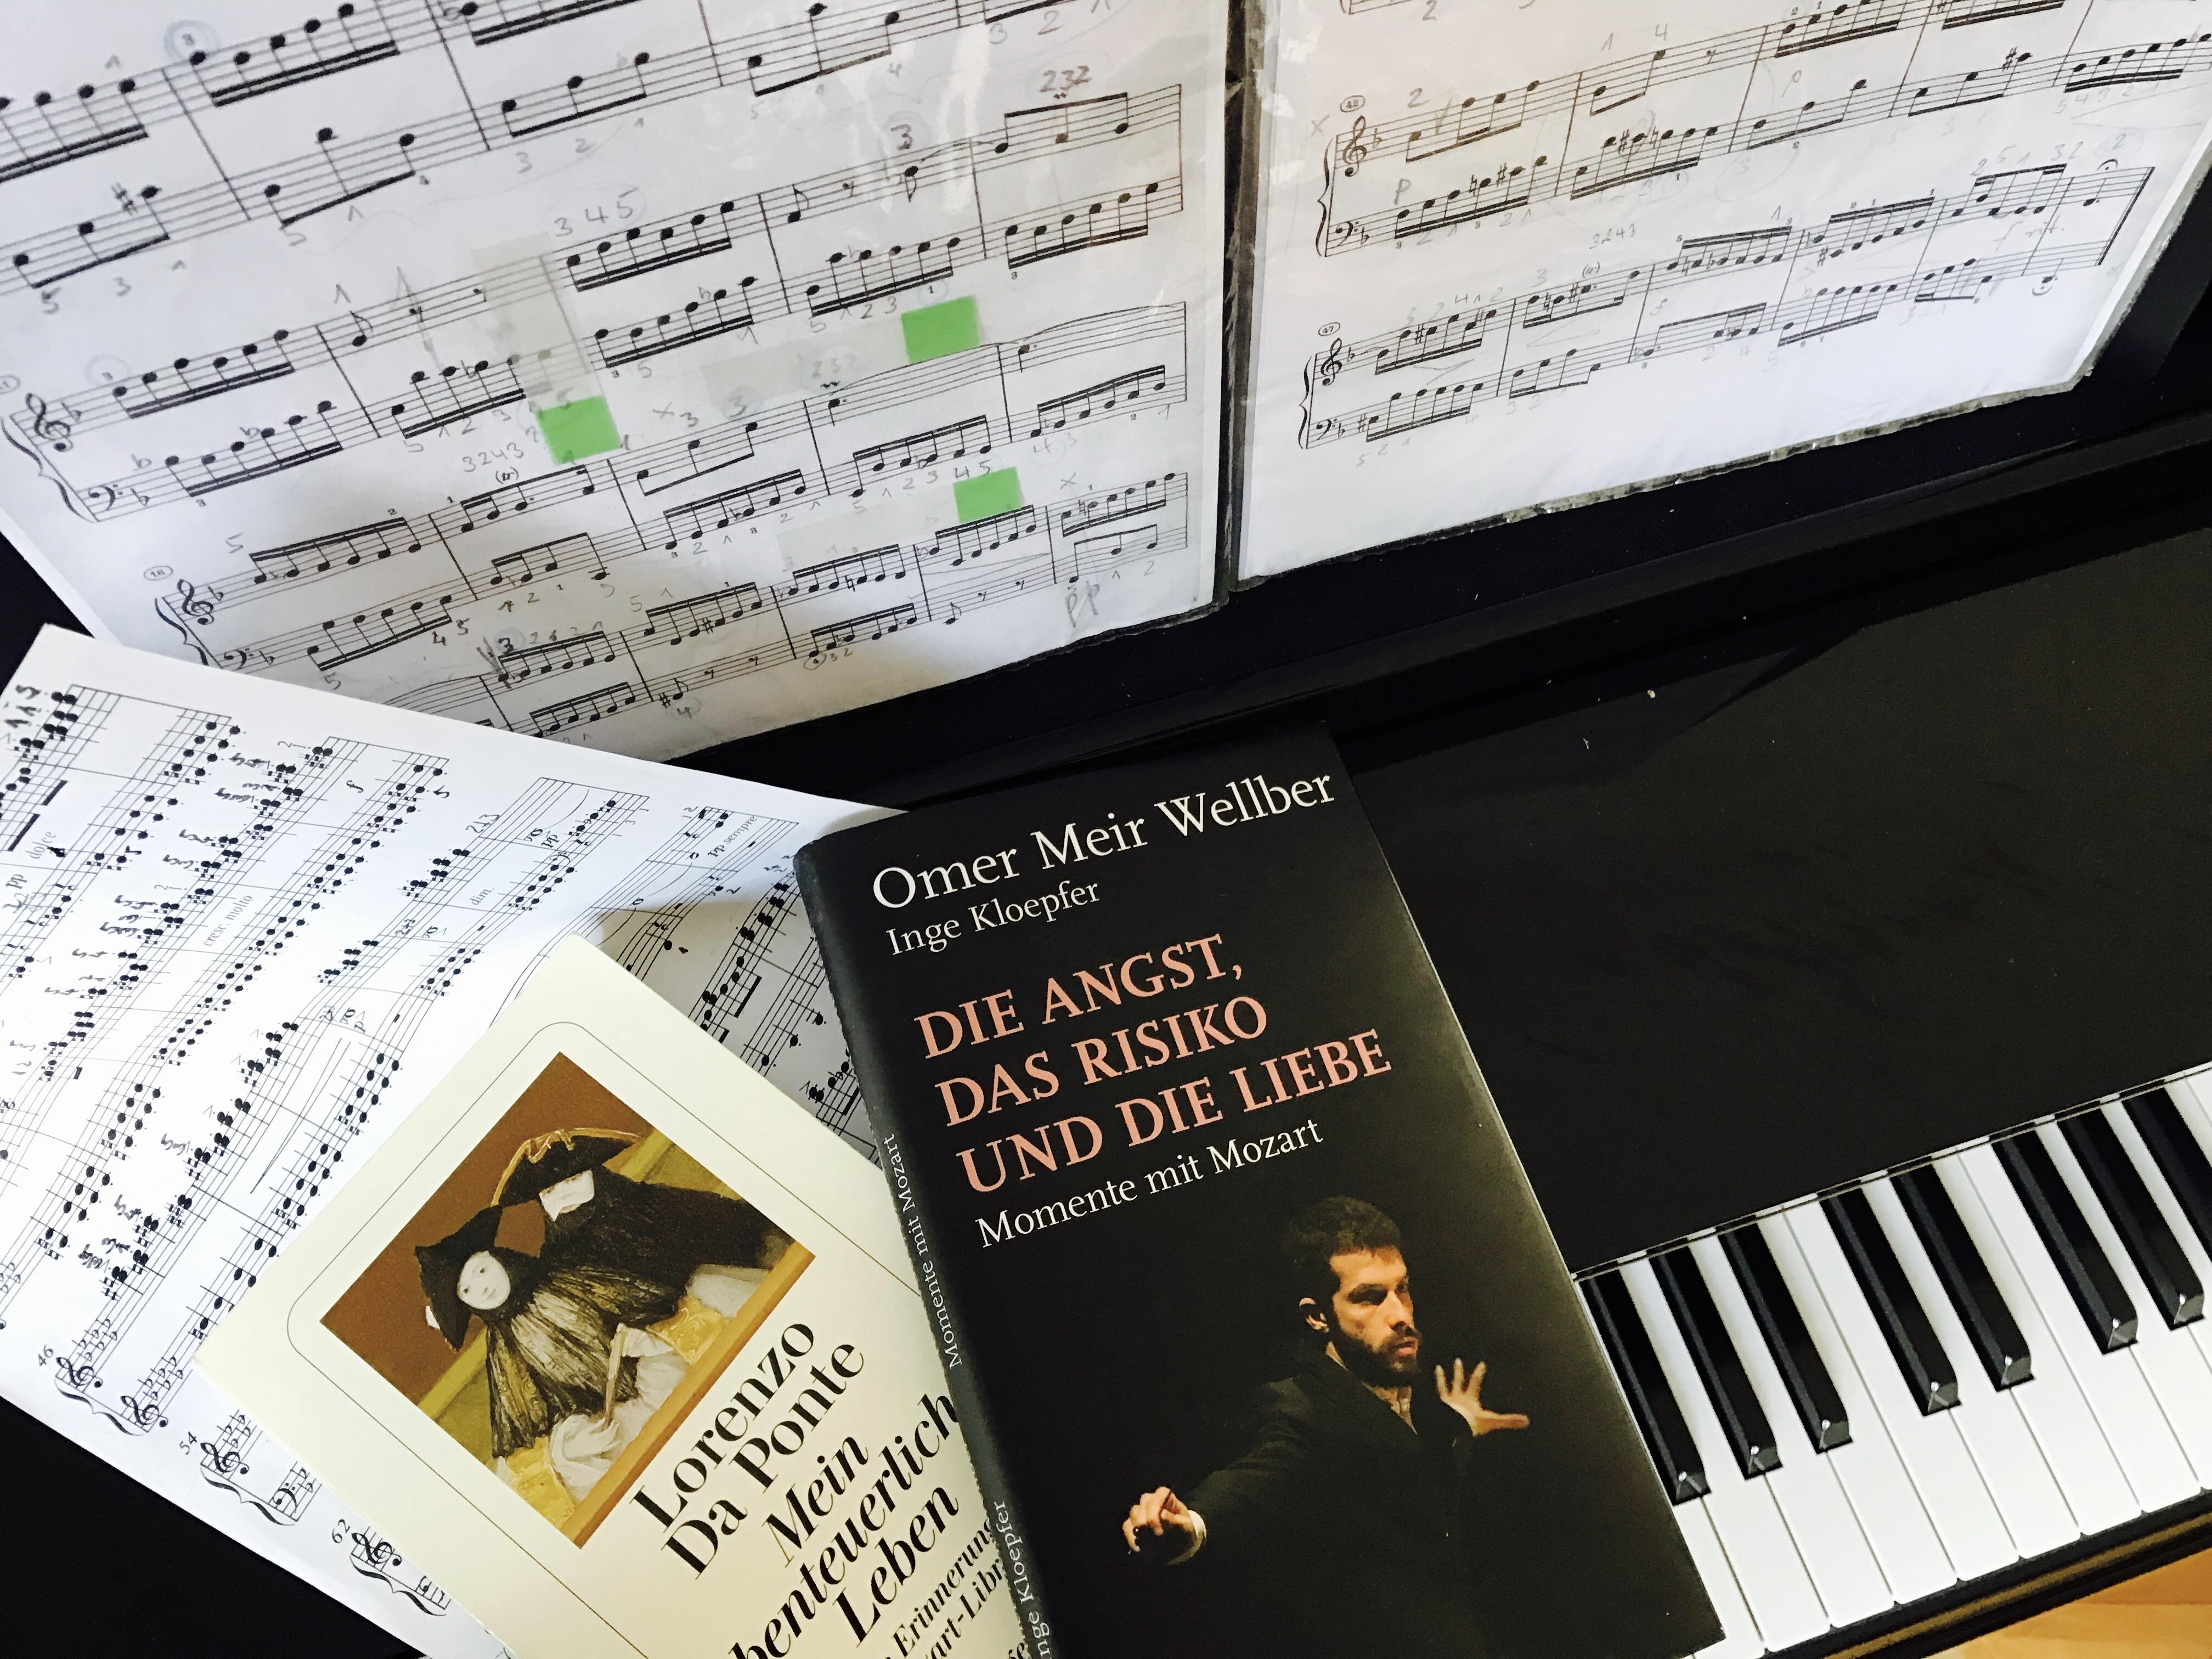 Mozart-Kloepfer